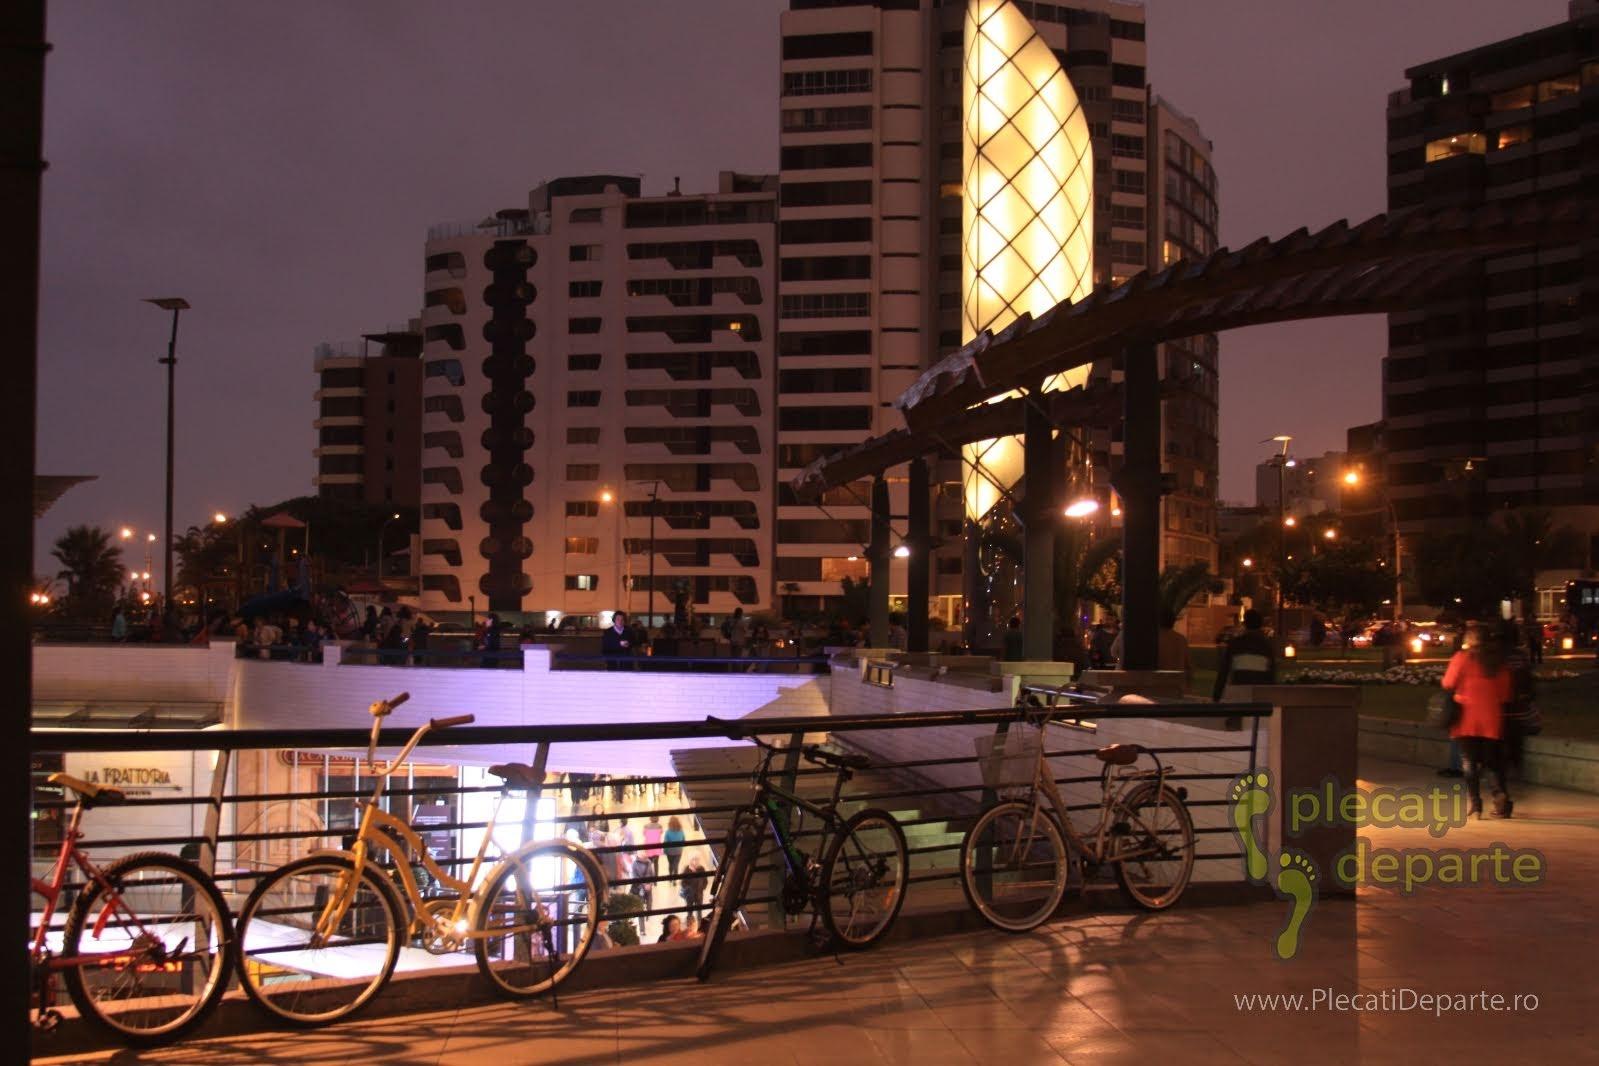 Larcomar, in cartierul Miraflores, in zona centrala a orasului Lima, capitala Peru